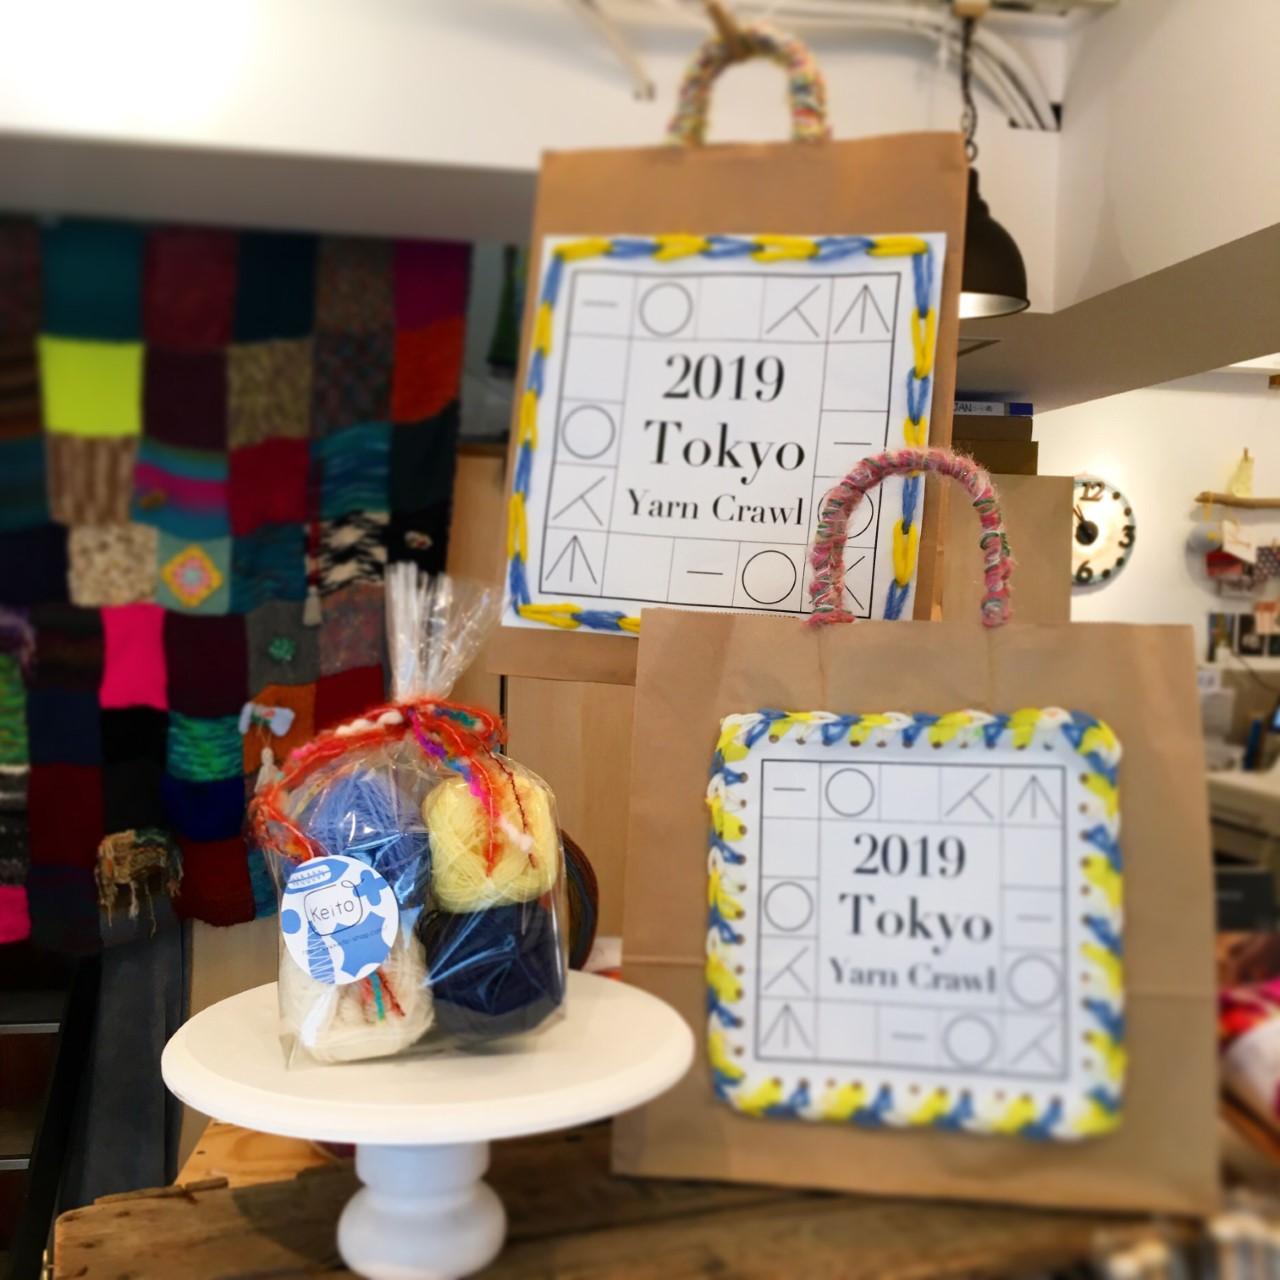 【2019 TOKYO YARN CRAWL 】参加します!